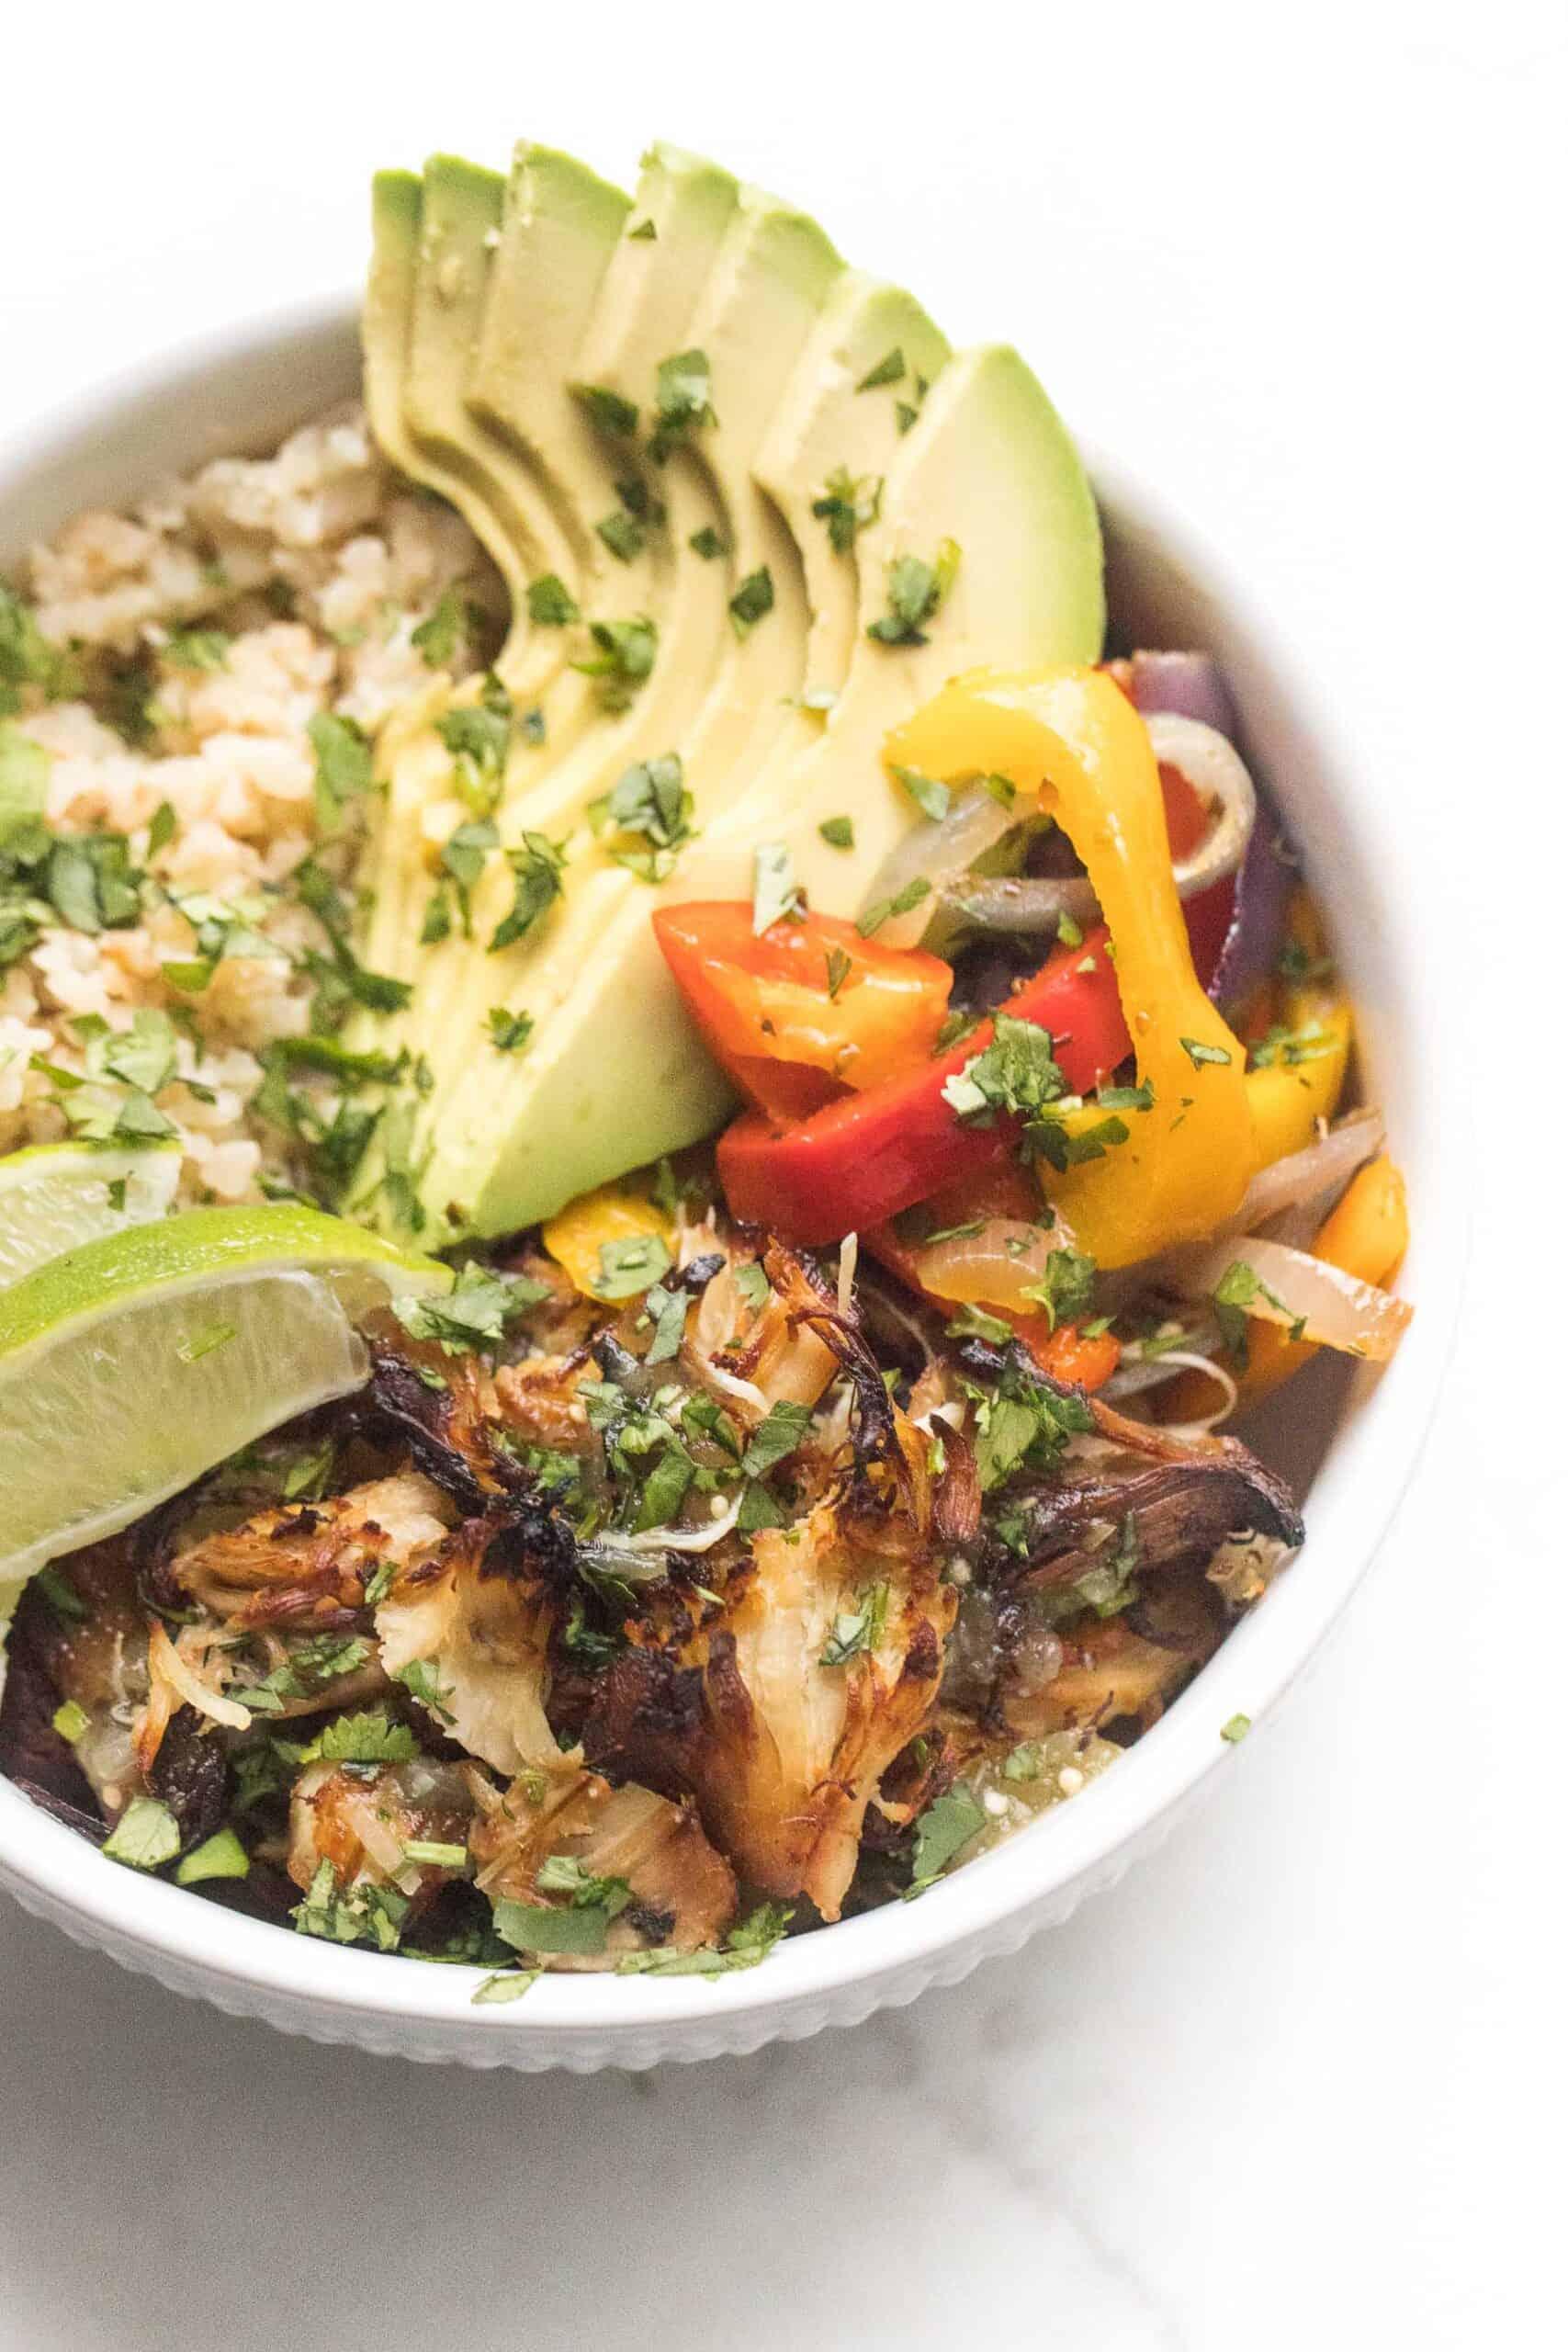 crispy verde chicken burrito bowl on a white background